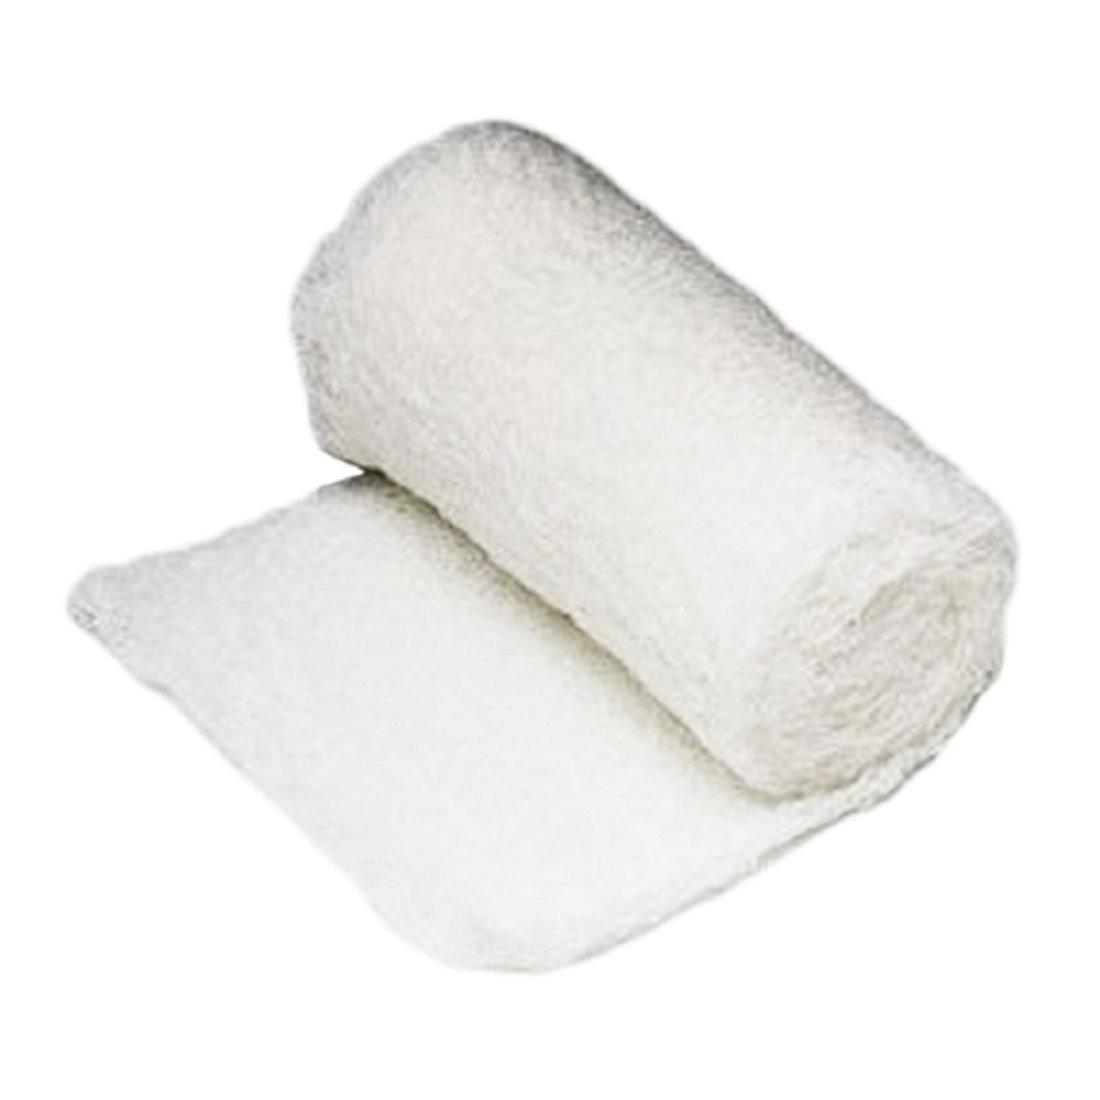 Kerlix Gauze Bandage Roll , 6 Ply, 2.25 Inch X 3 Yard, Covidien 1801 - Pack of 12